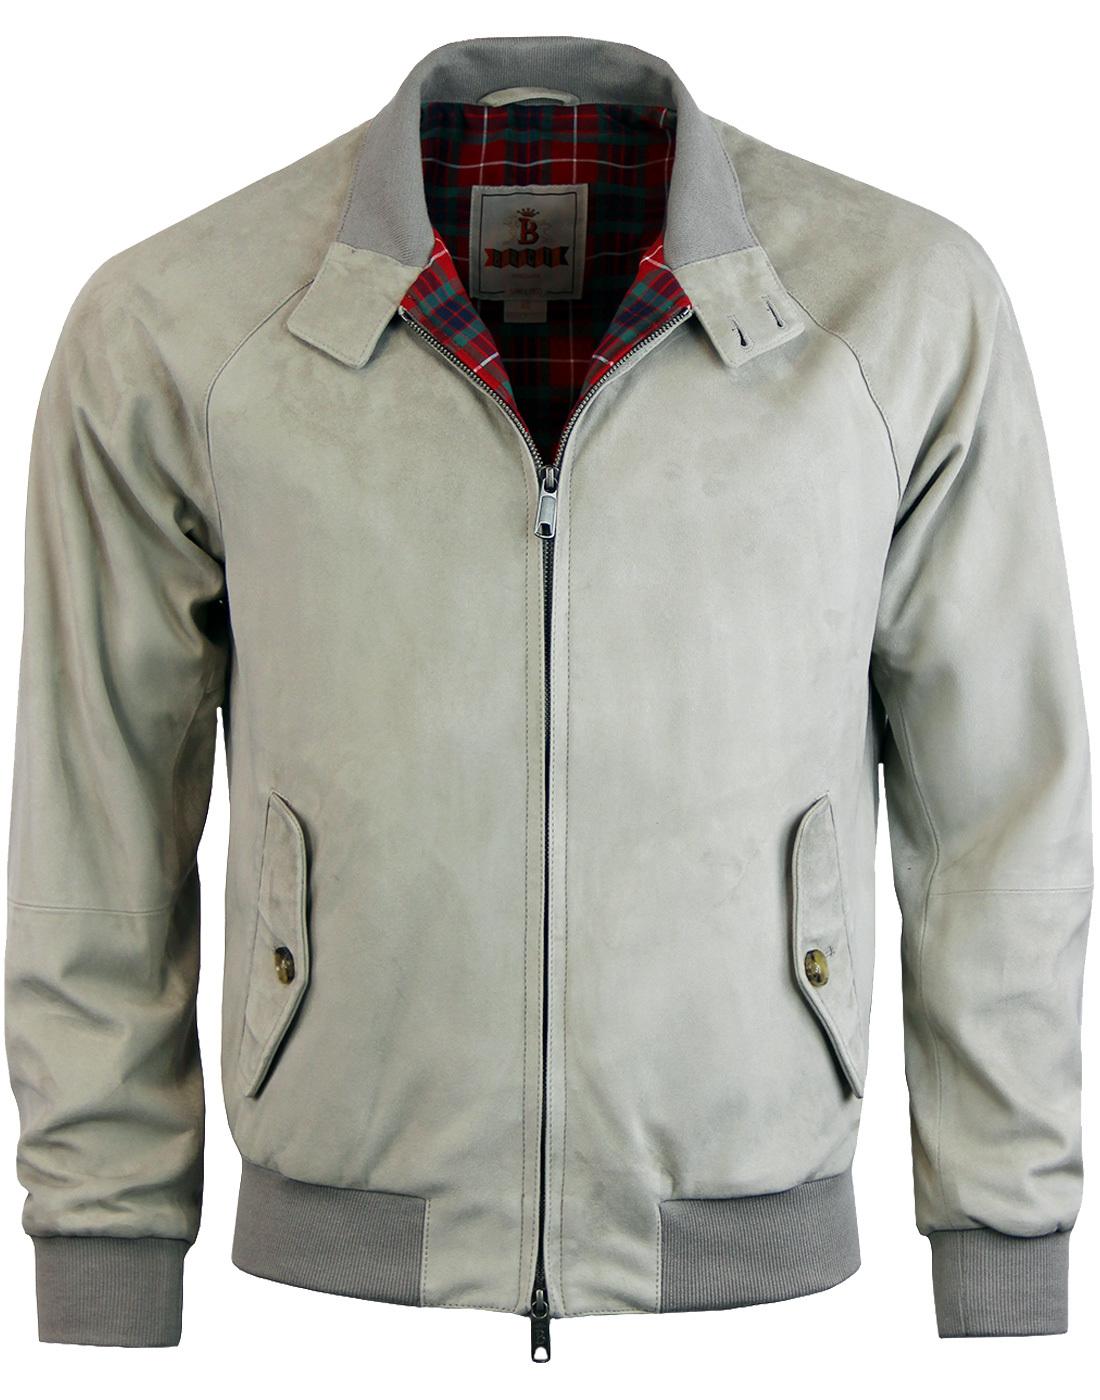 21588807905c3 BARACUTA G9 Mod 60s Suede Harrington jacket in Mist